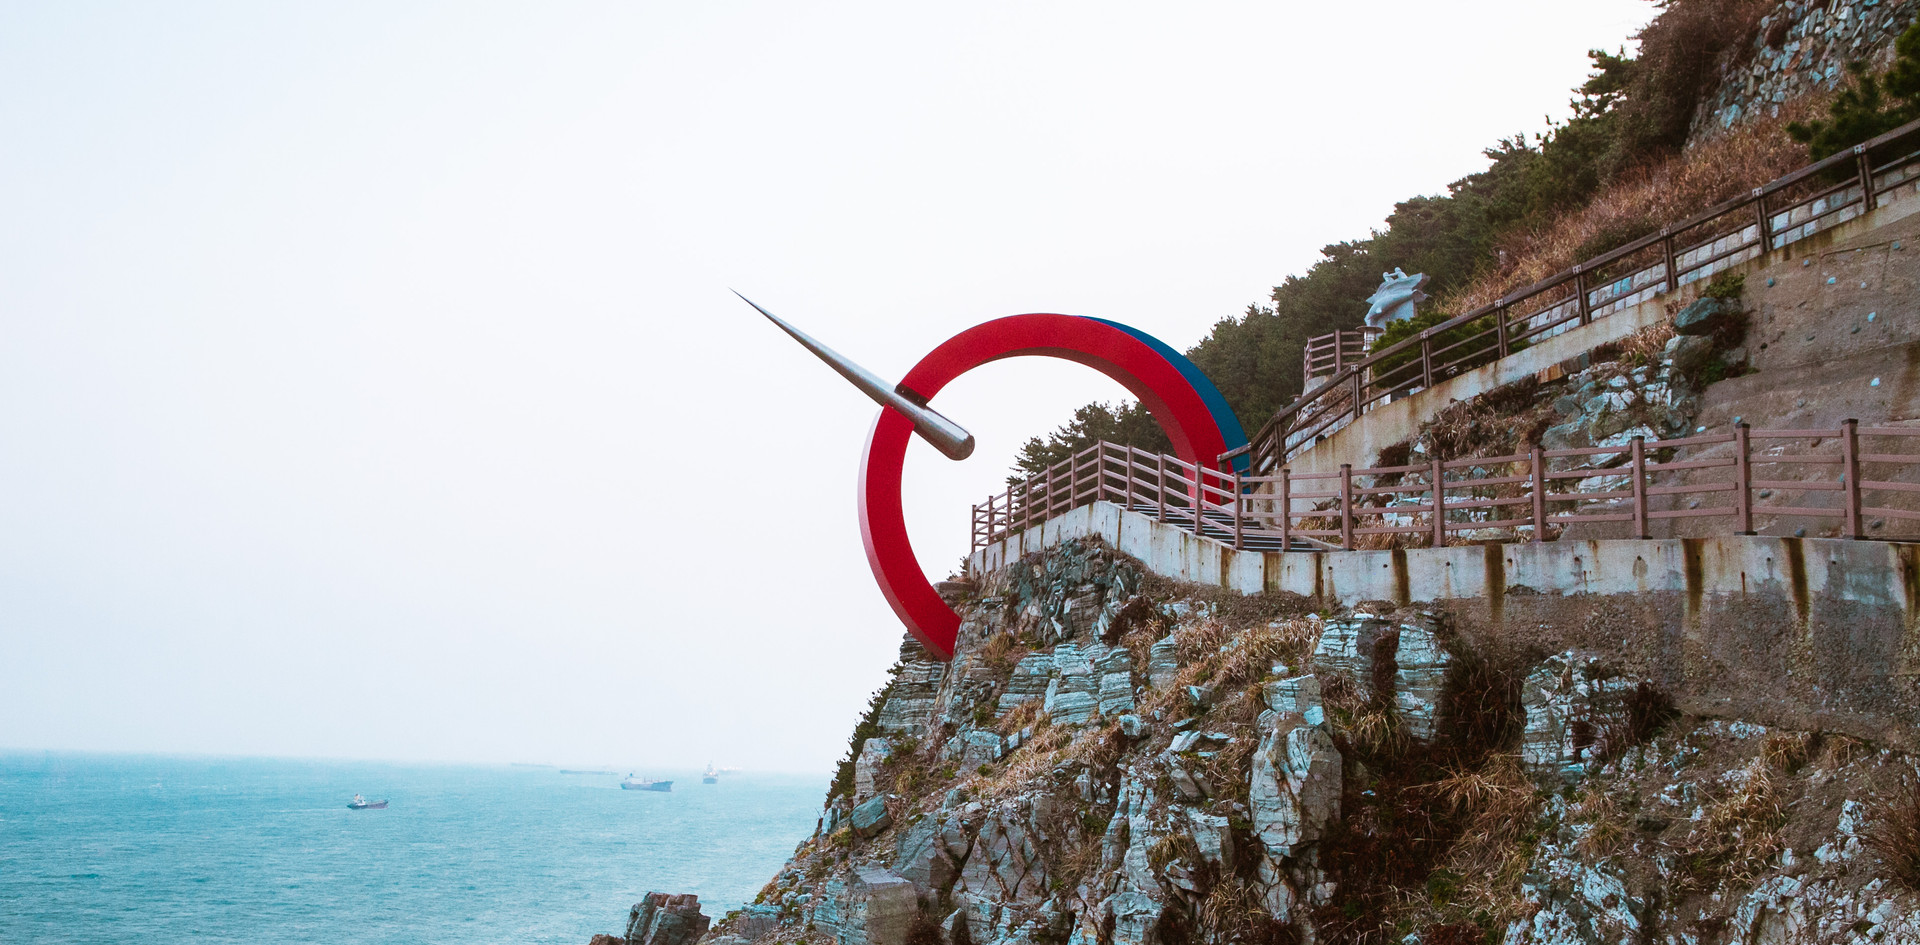 Taejongdae Cliffs